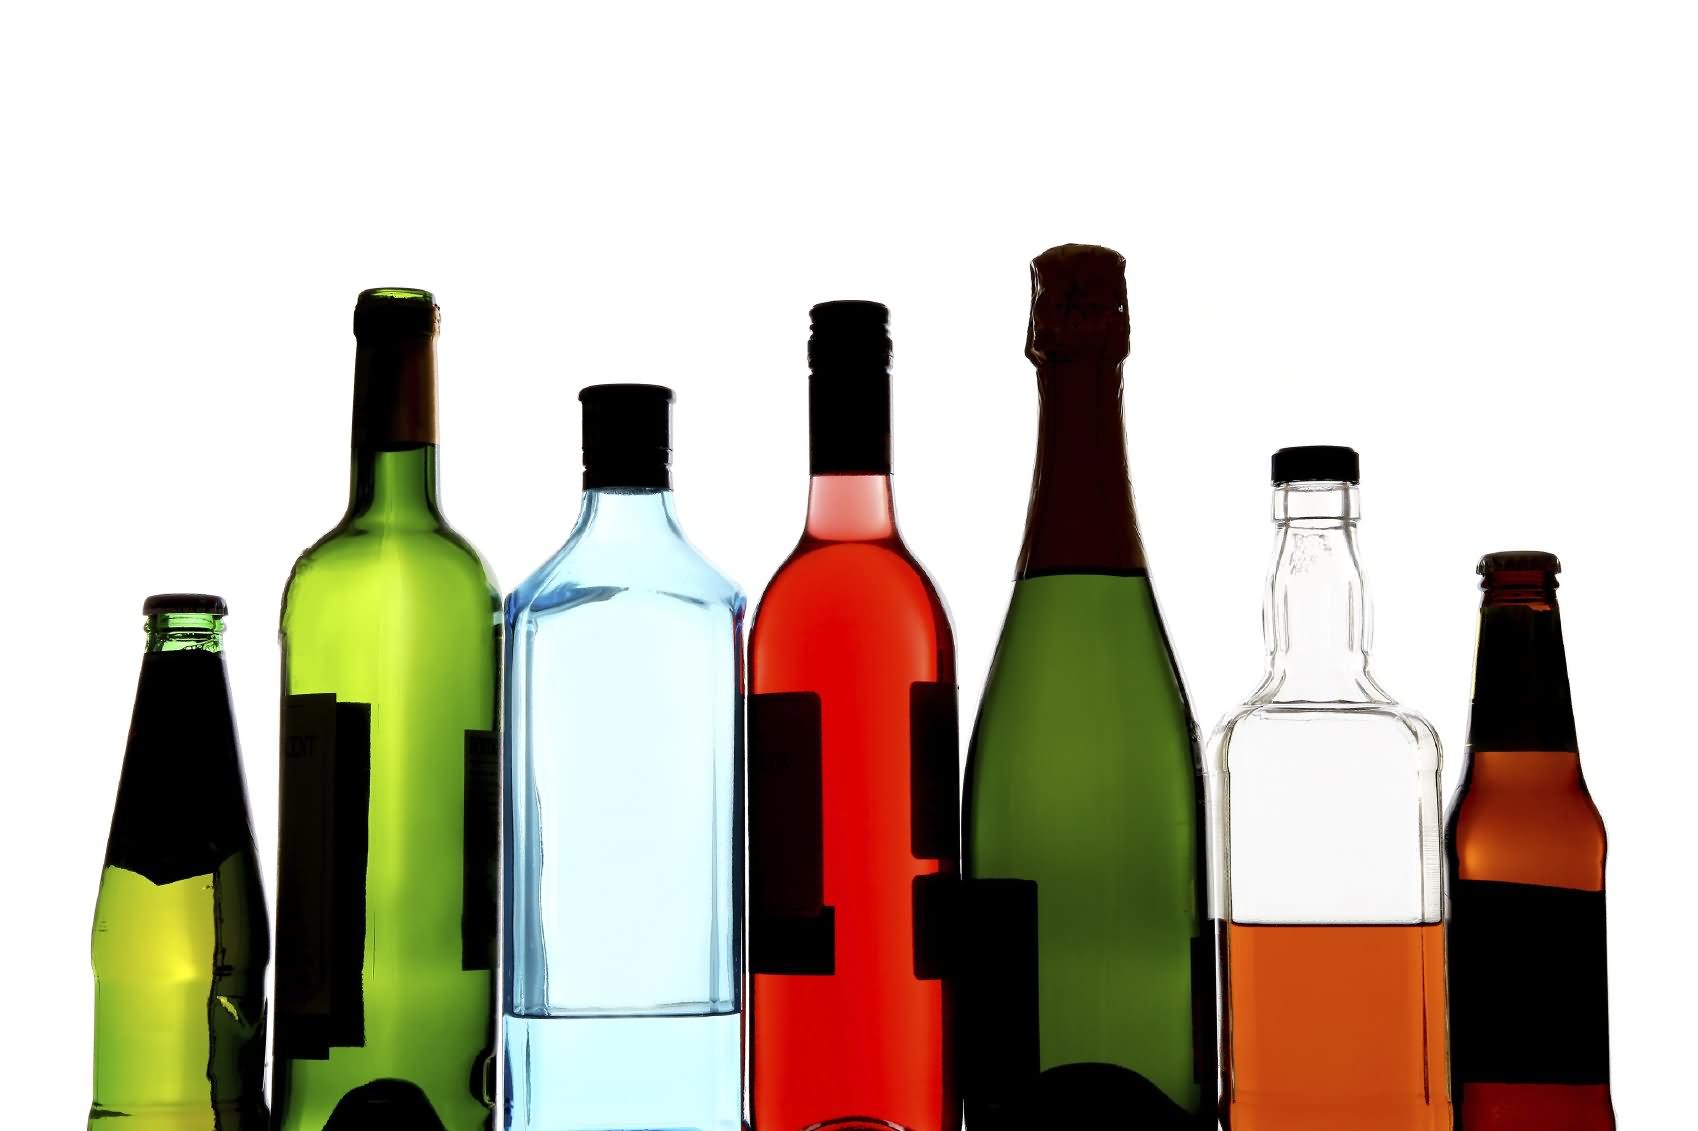 Bottle clipart alcohol, Bottle alcohol Transparent FREE for.